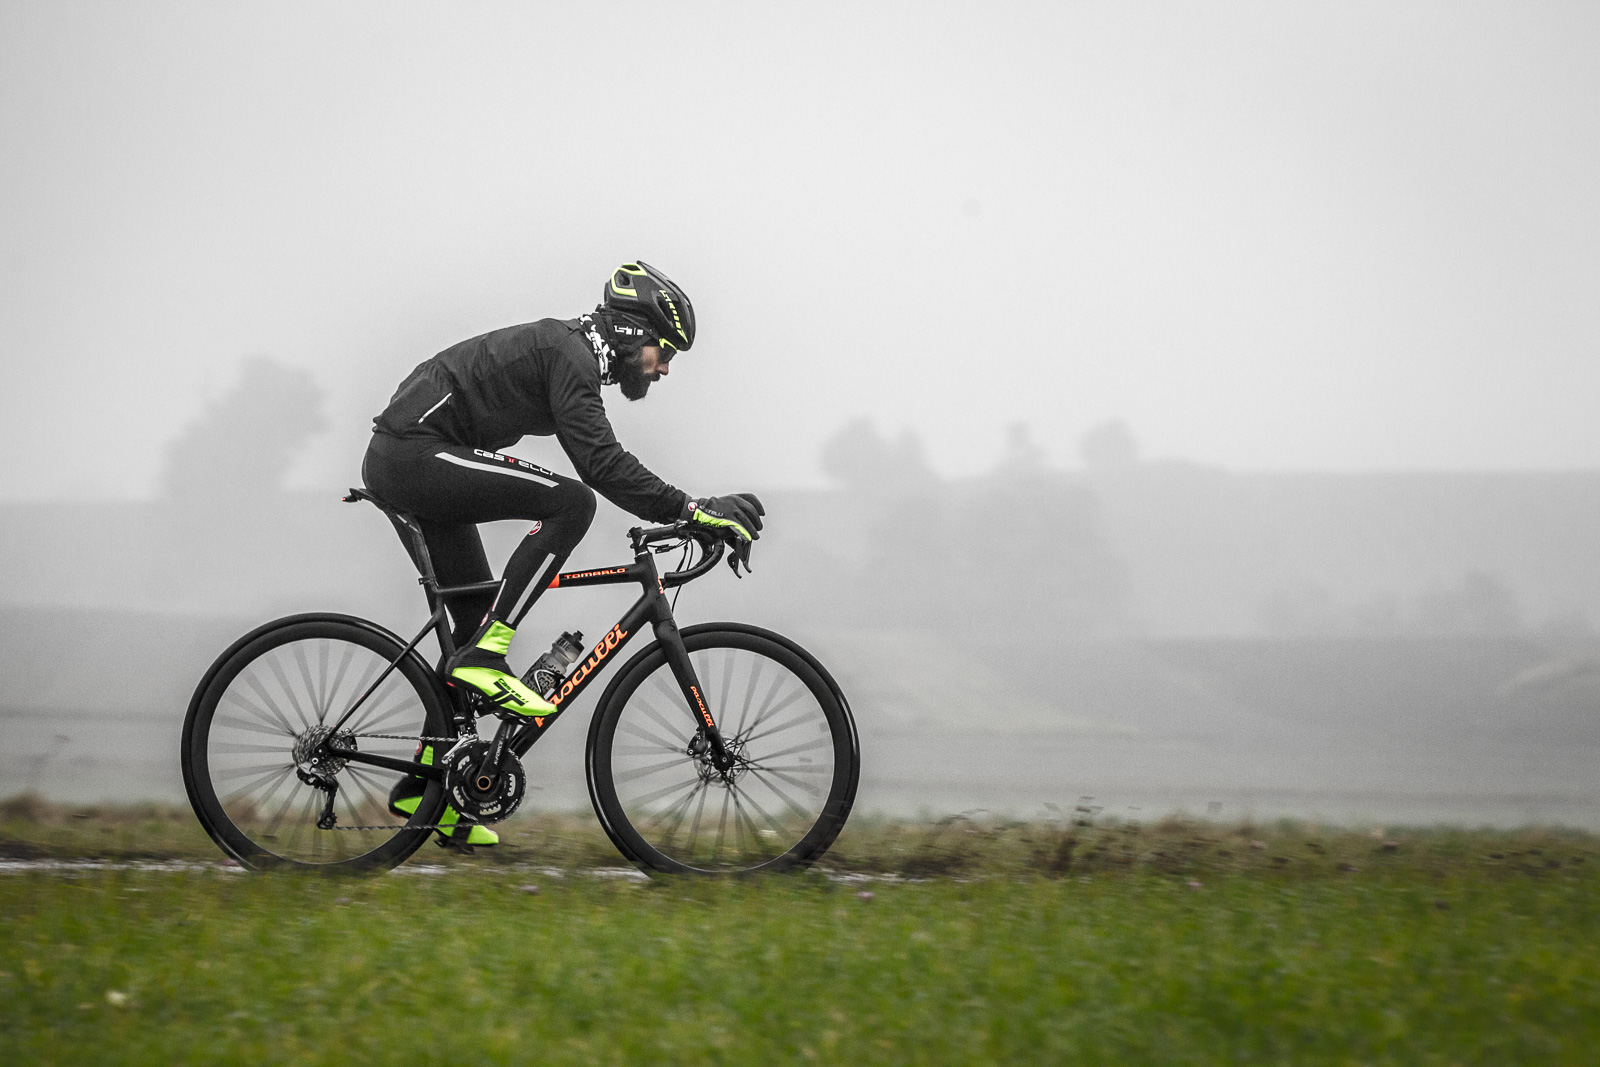 Pasculli Tomarlo Disc #roadbikedisco - Foto 18 / 41